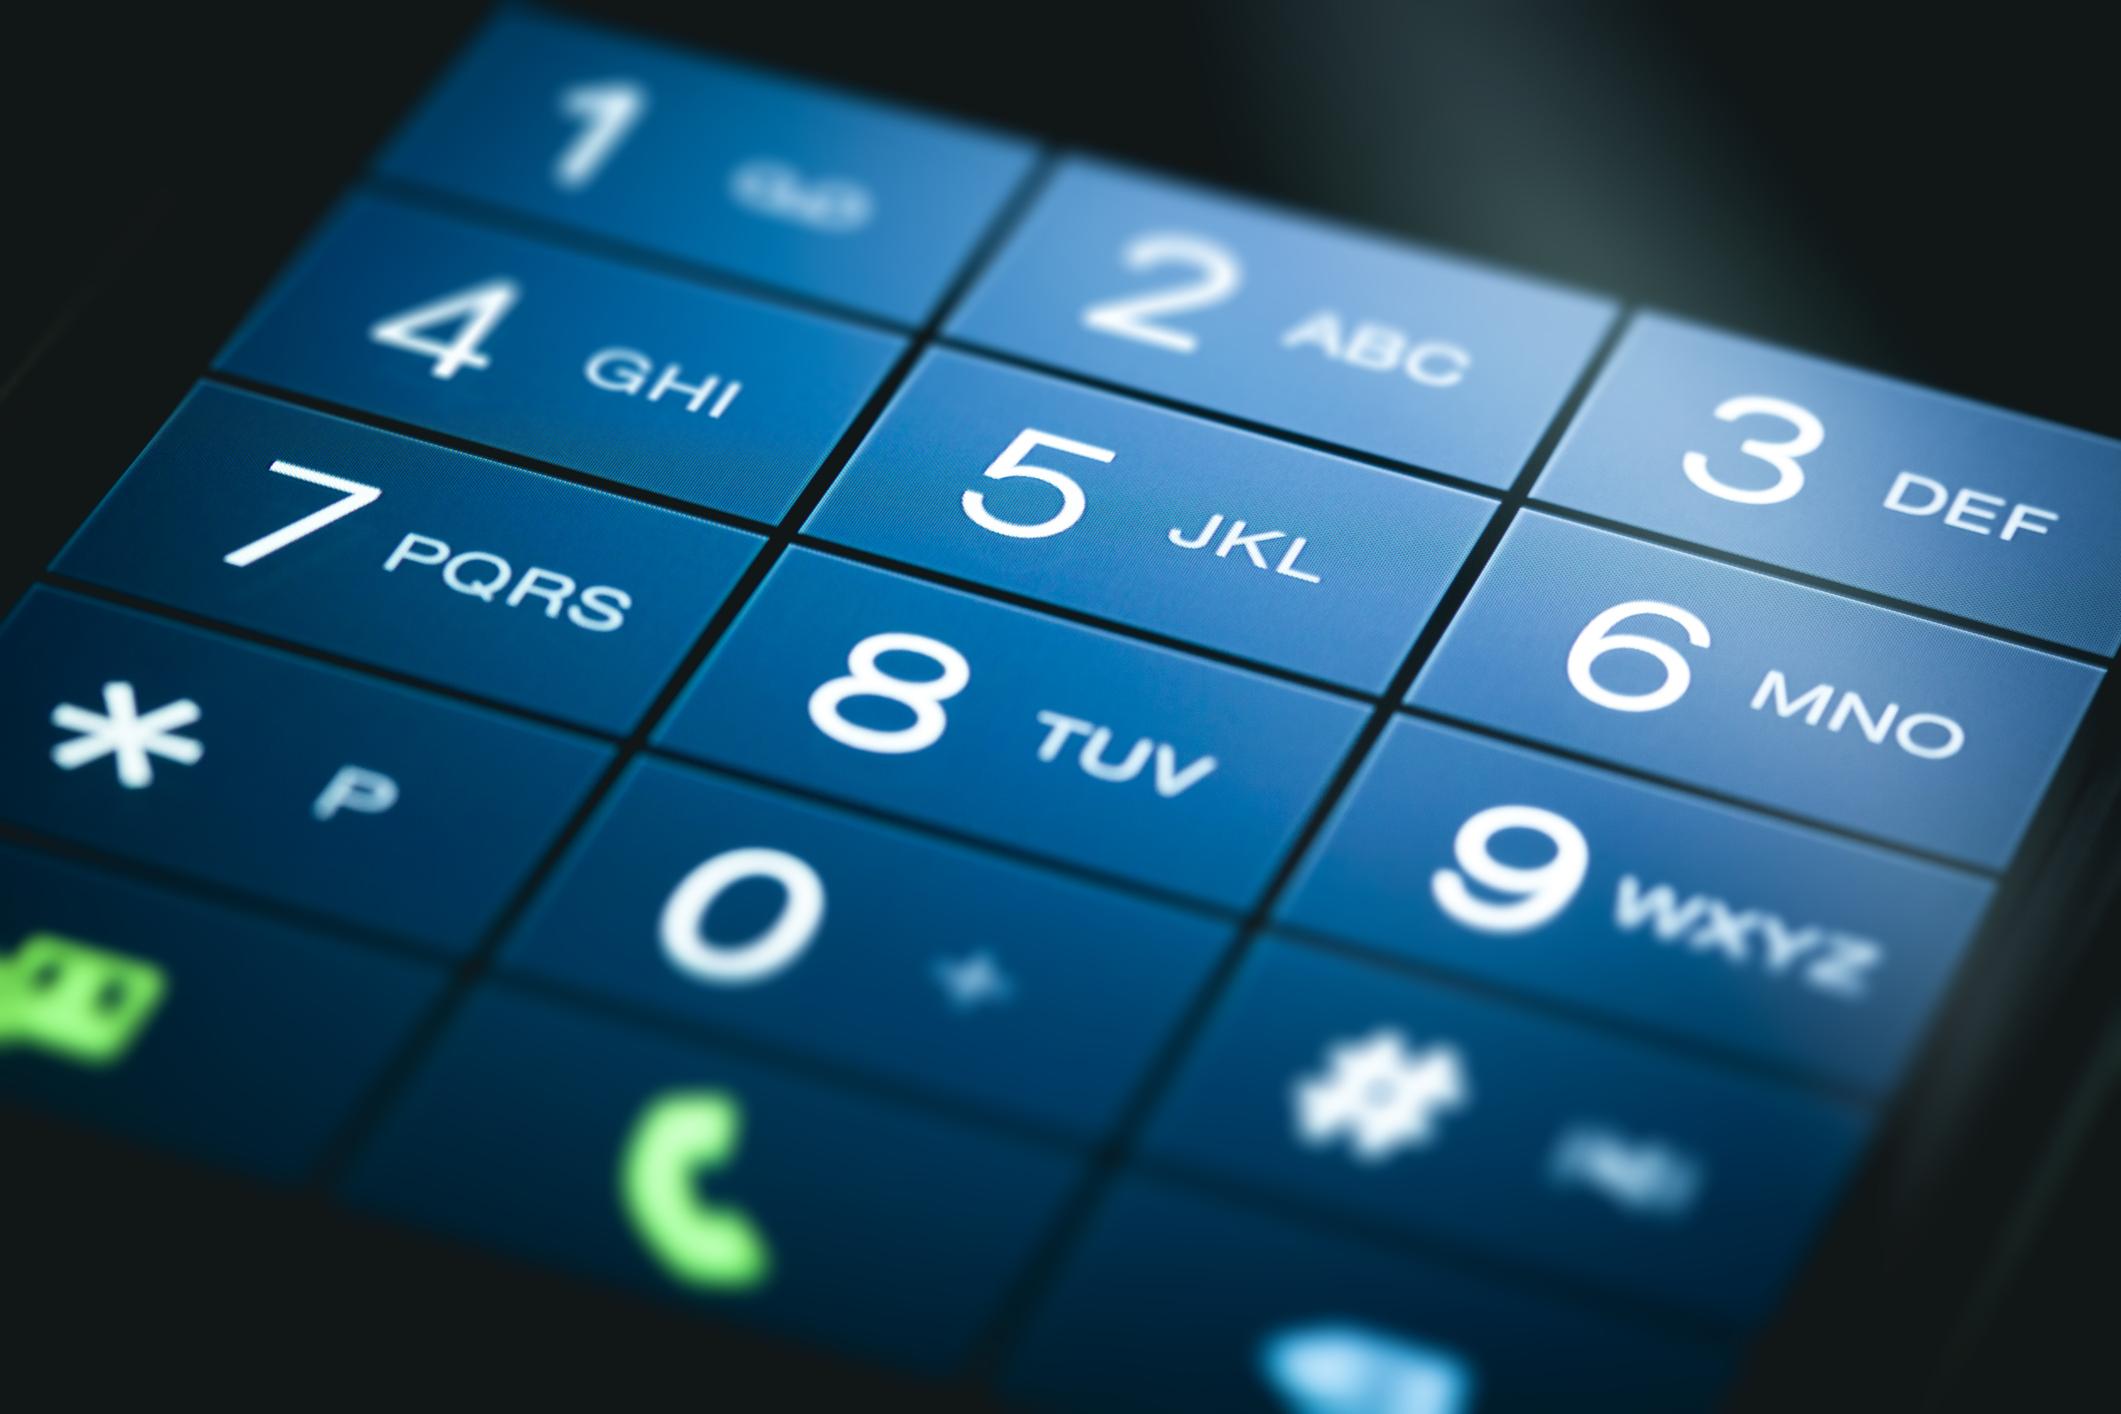 mobile phone screen